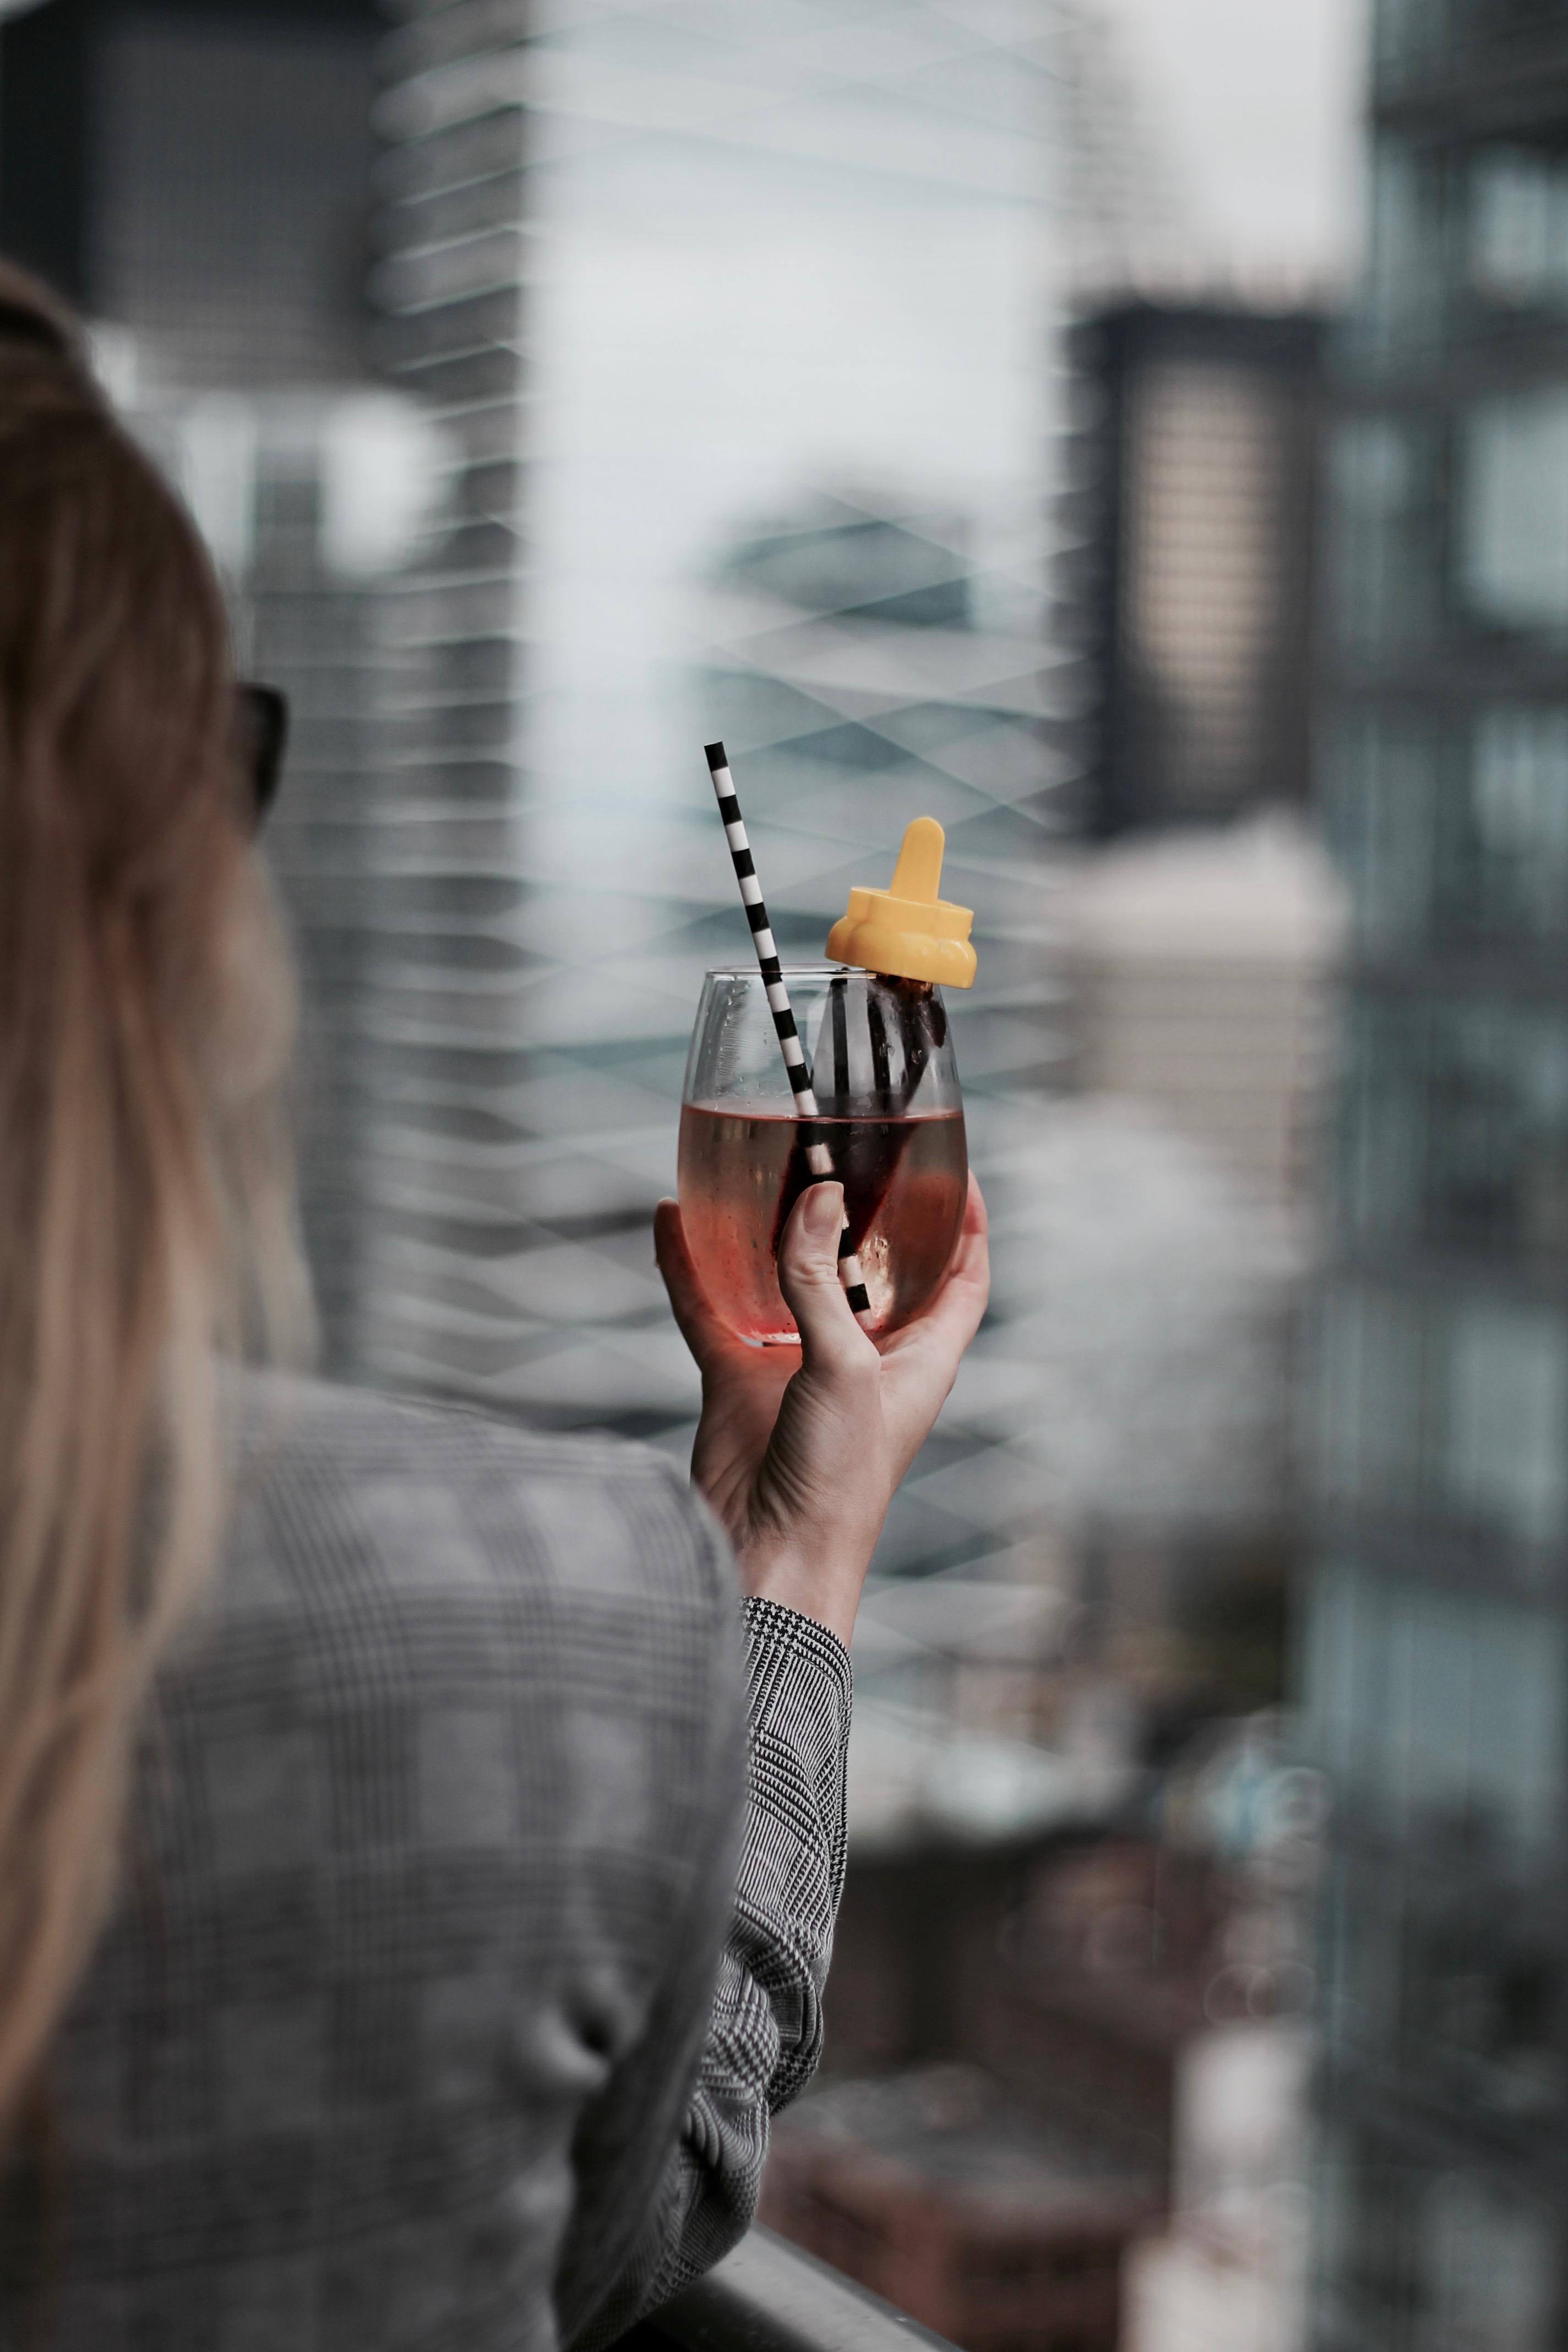 MON MODE Blog | Mon Mode | Fashion Blog | Toronto Blogger | Wine Cocktail | Wine Popsicle Cocktail | Raven Cospiracy